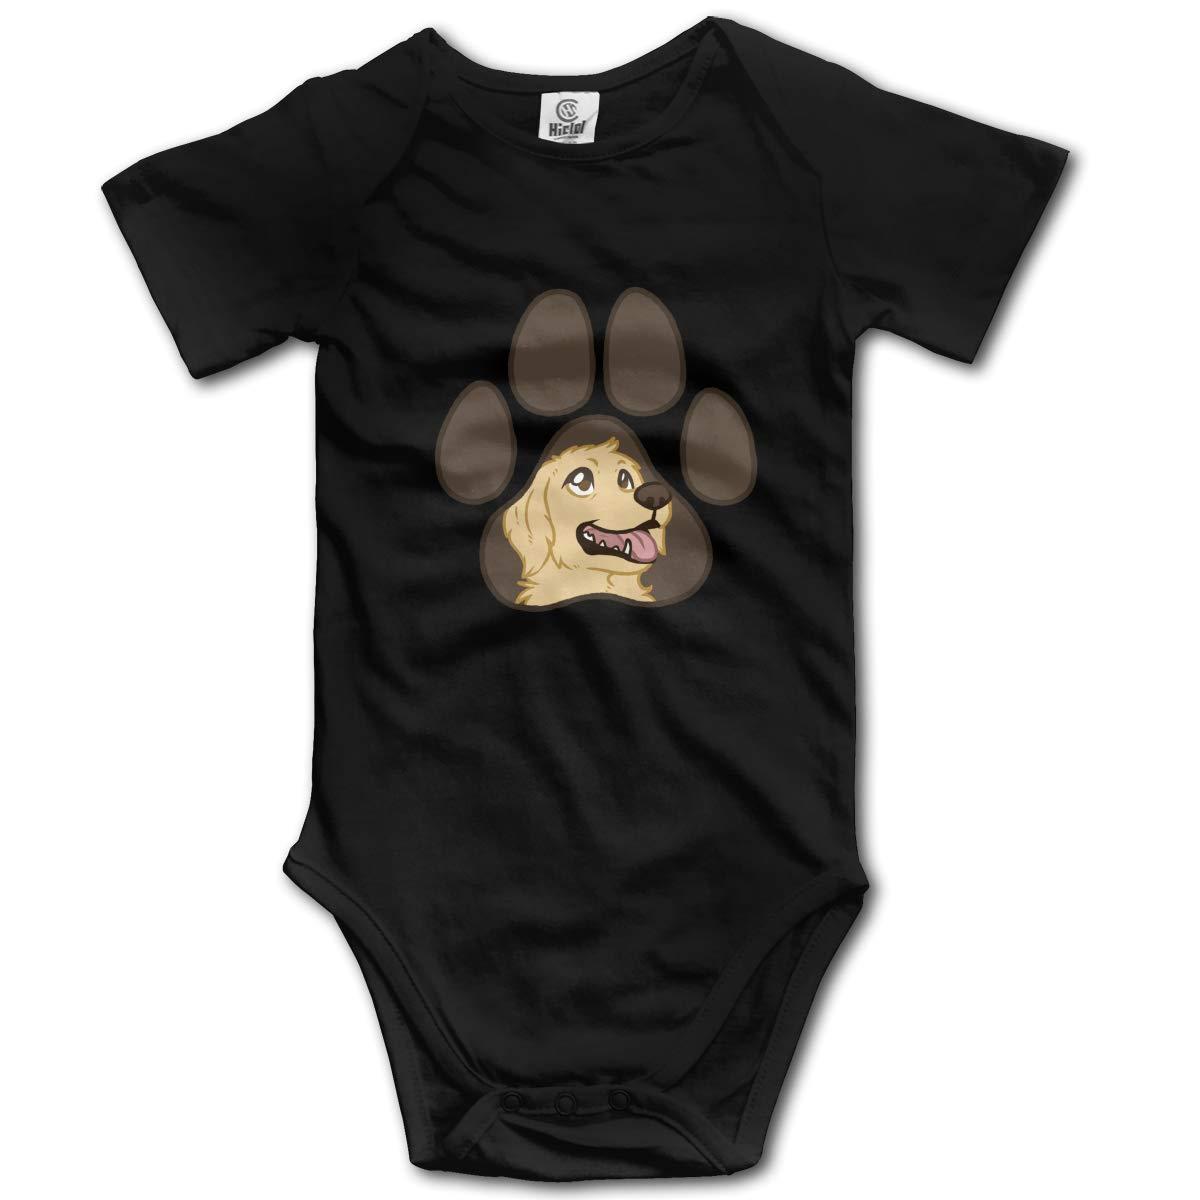 Black-Brown Paw Dog Infant Boys Girls Jumpsuit Short-Sleeve Romper Bodysuit